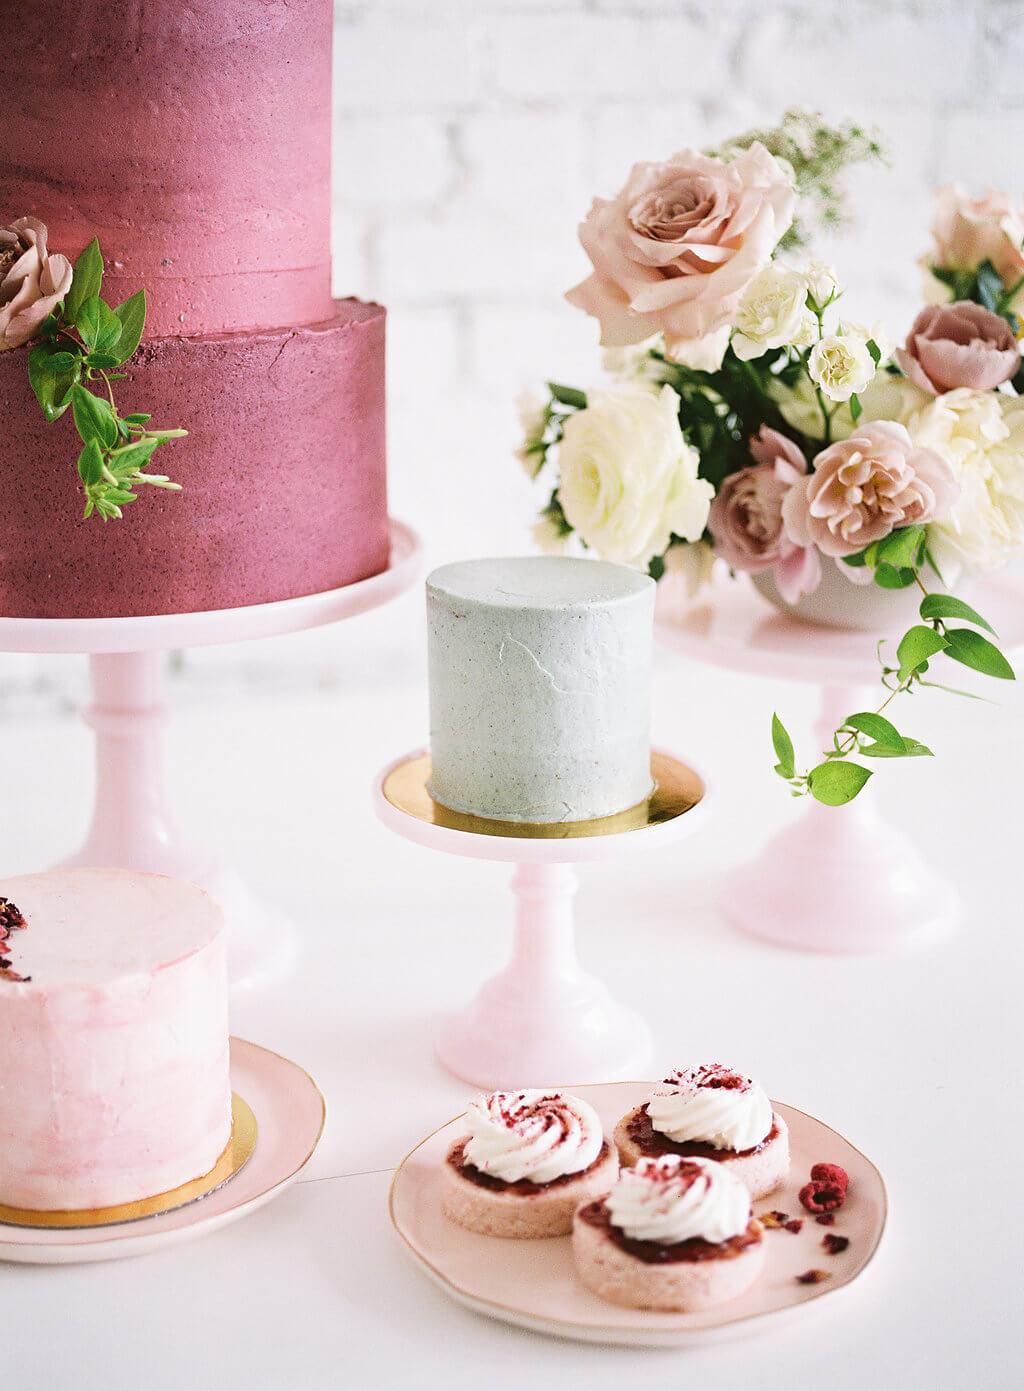 CakeTasting-01 copy.jpg